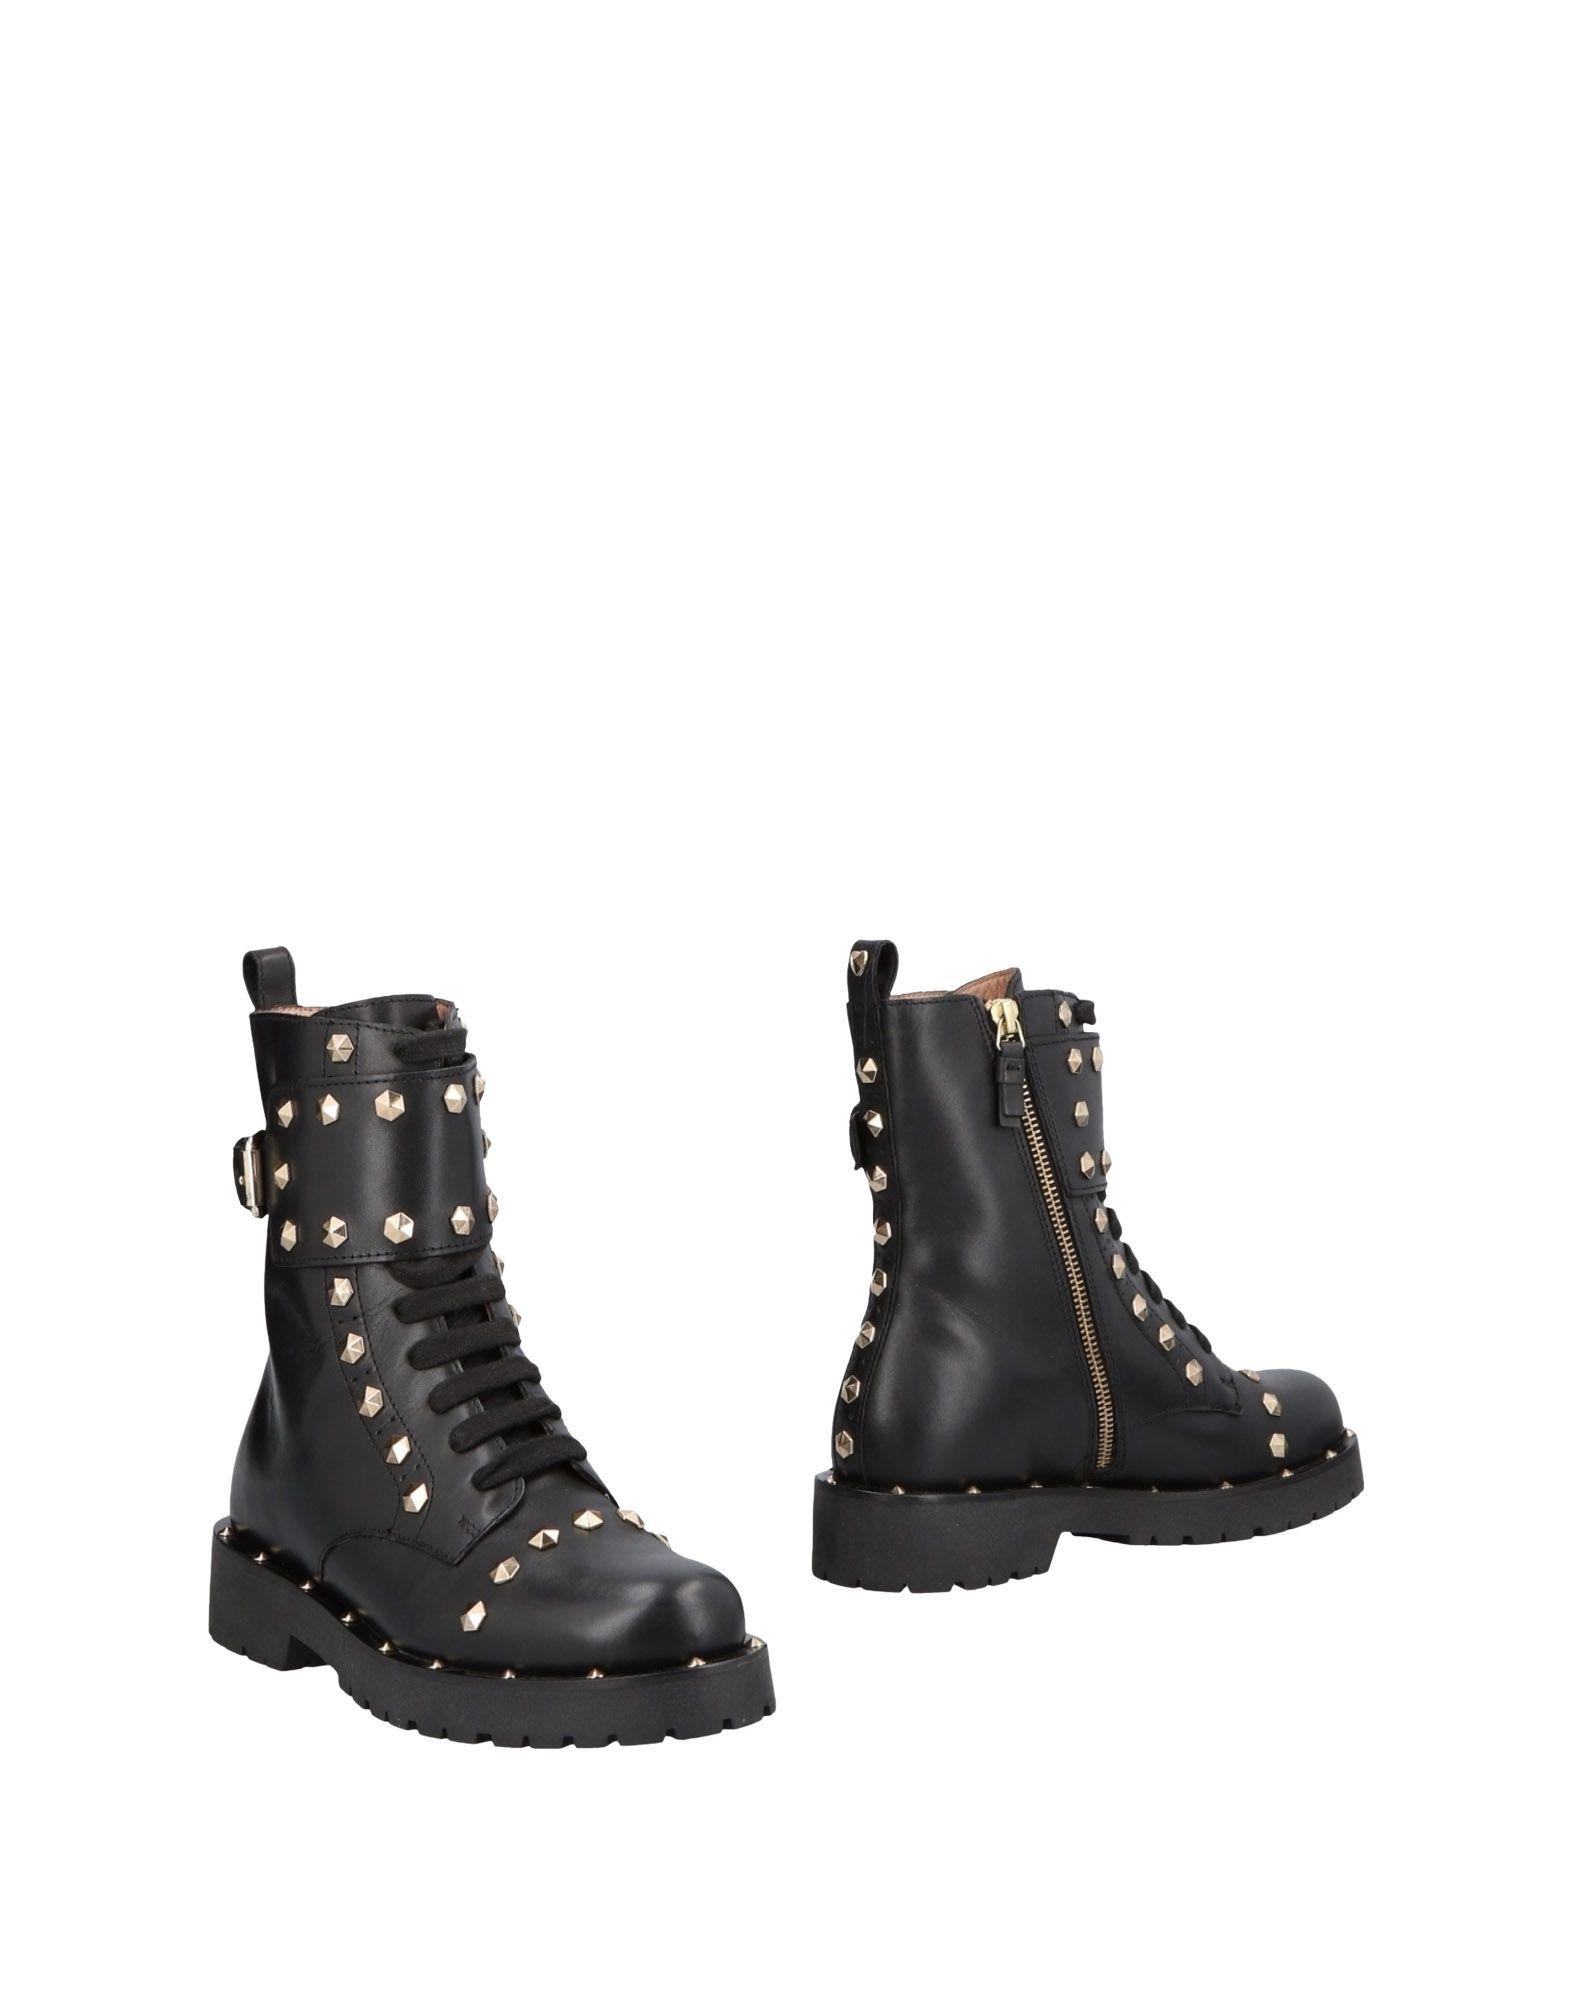 Haltbare Mode billige Schuhe Twin Schuhe 11472585UR Beliebte Schuhe Twin cee409